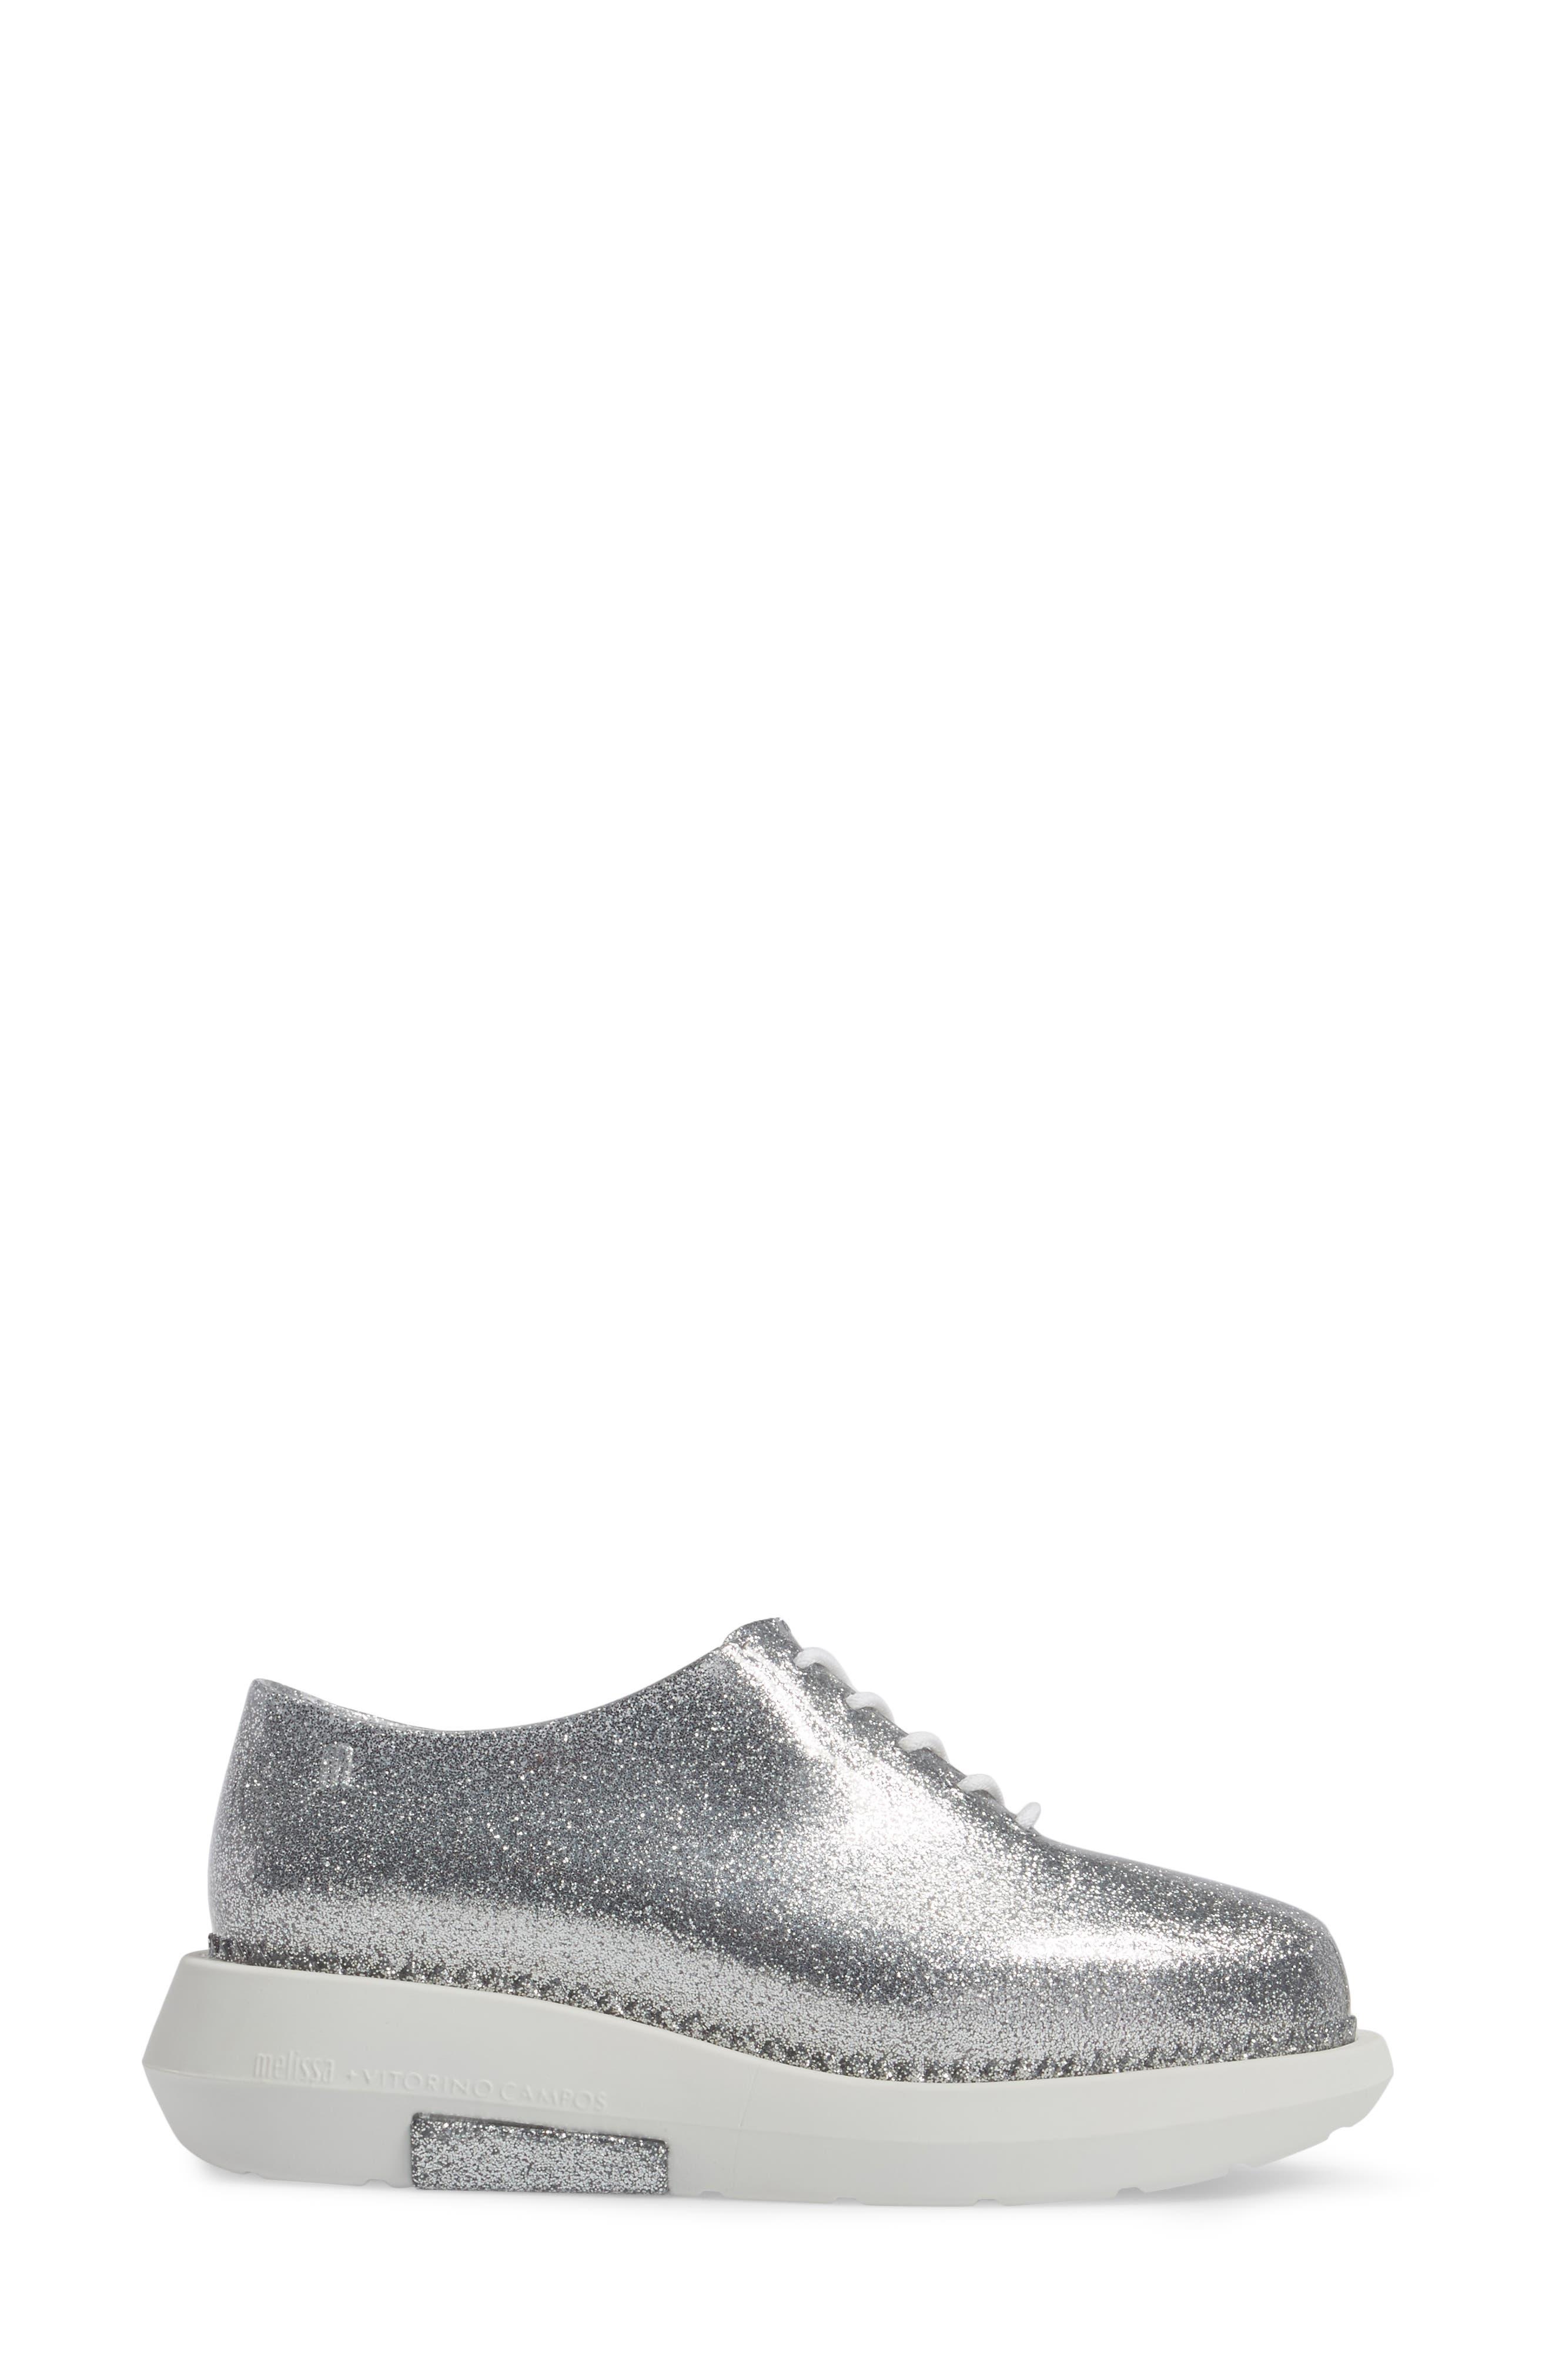 Grunge Vitorino Water Resistant Oxford,                             Alternate thumbnail 3, color,                             Silver Glitter White